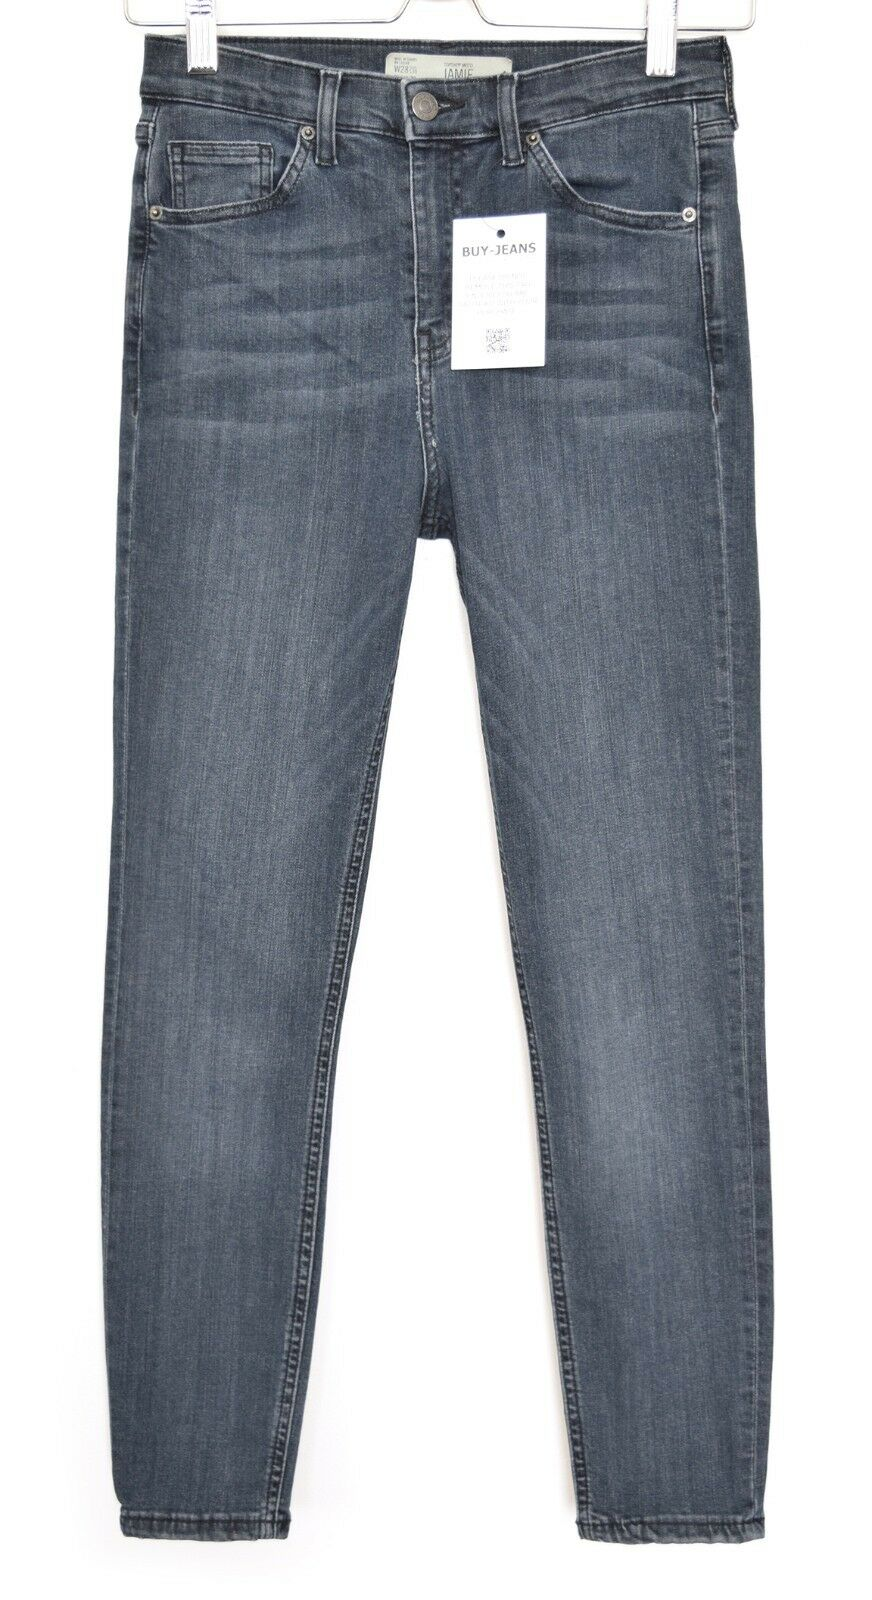 Topshop SUPER SKINNY JAMIE High Waist bluee Ankle Stretch Jeans Size 10 W28 L30